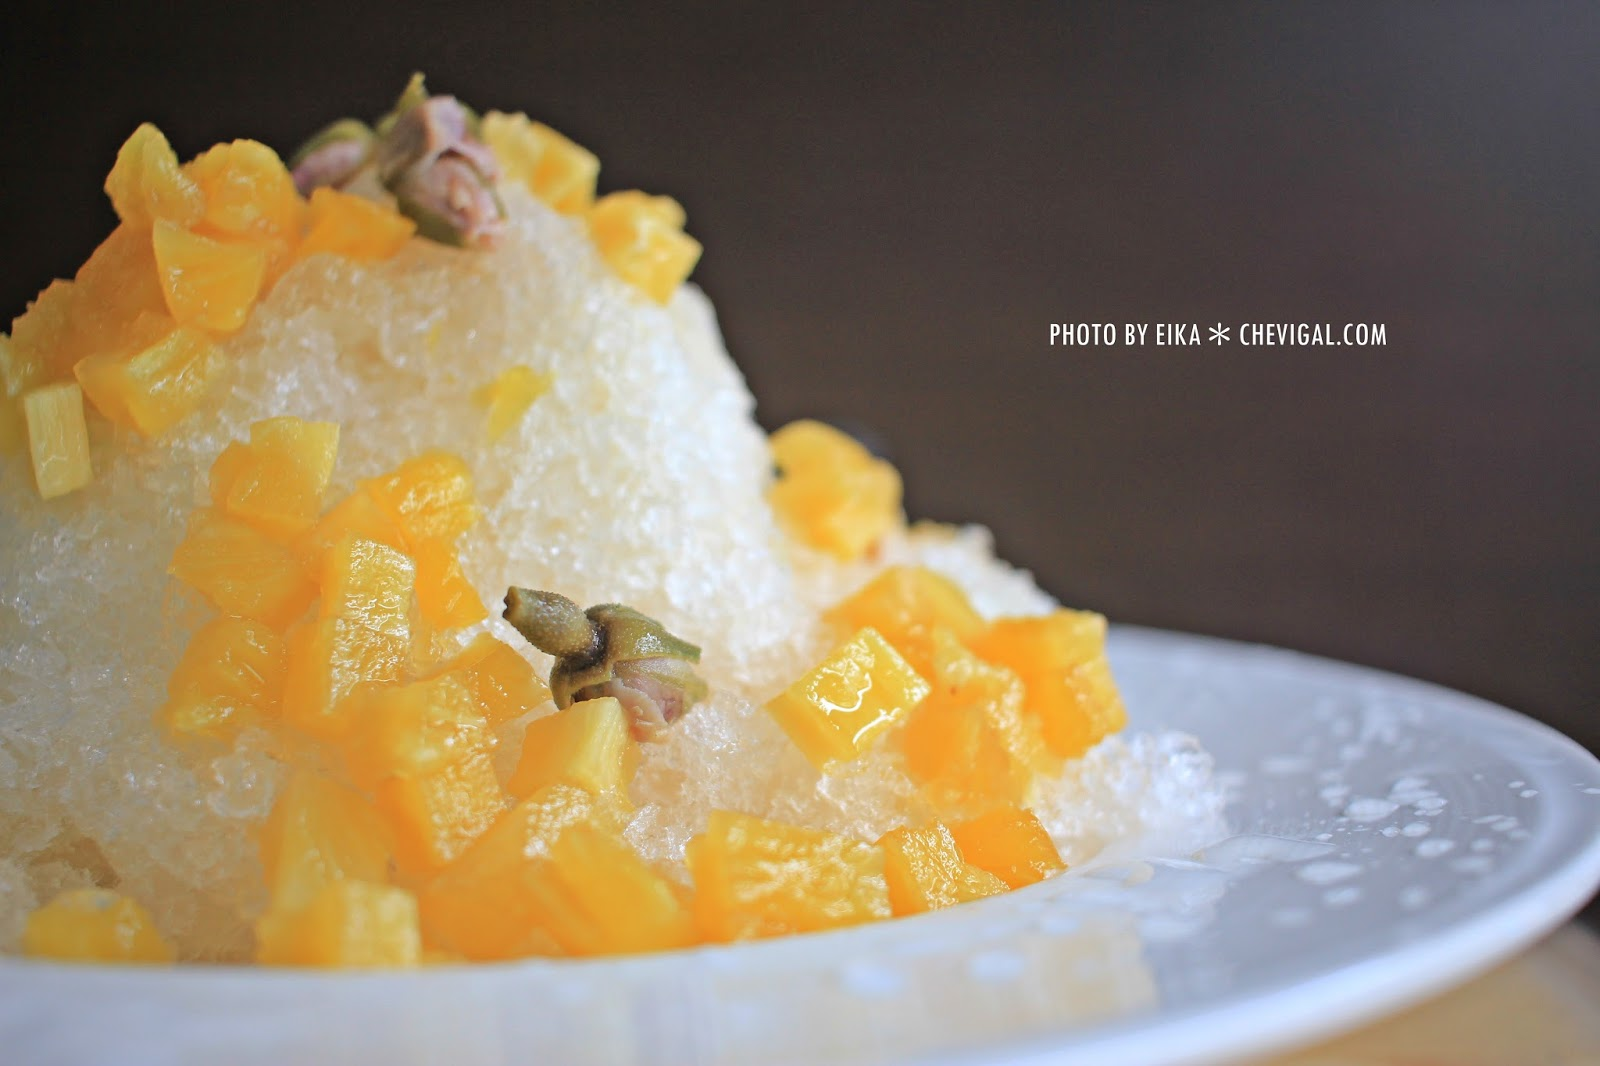 IMG 0144 - 台中烏日│蔡冰甜品。雪山上的愛情最純粹。全台獨有的鳳梨玫瑰冰。等你來感受芬芳原味